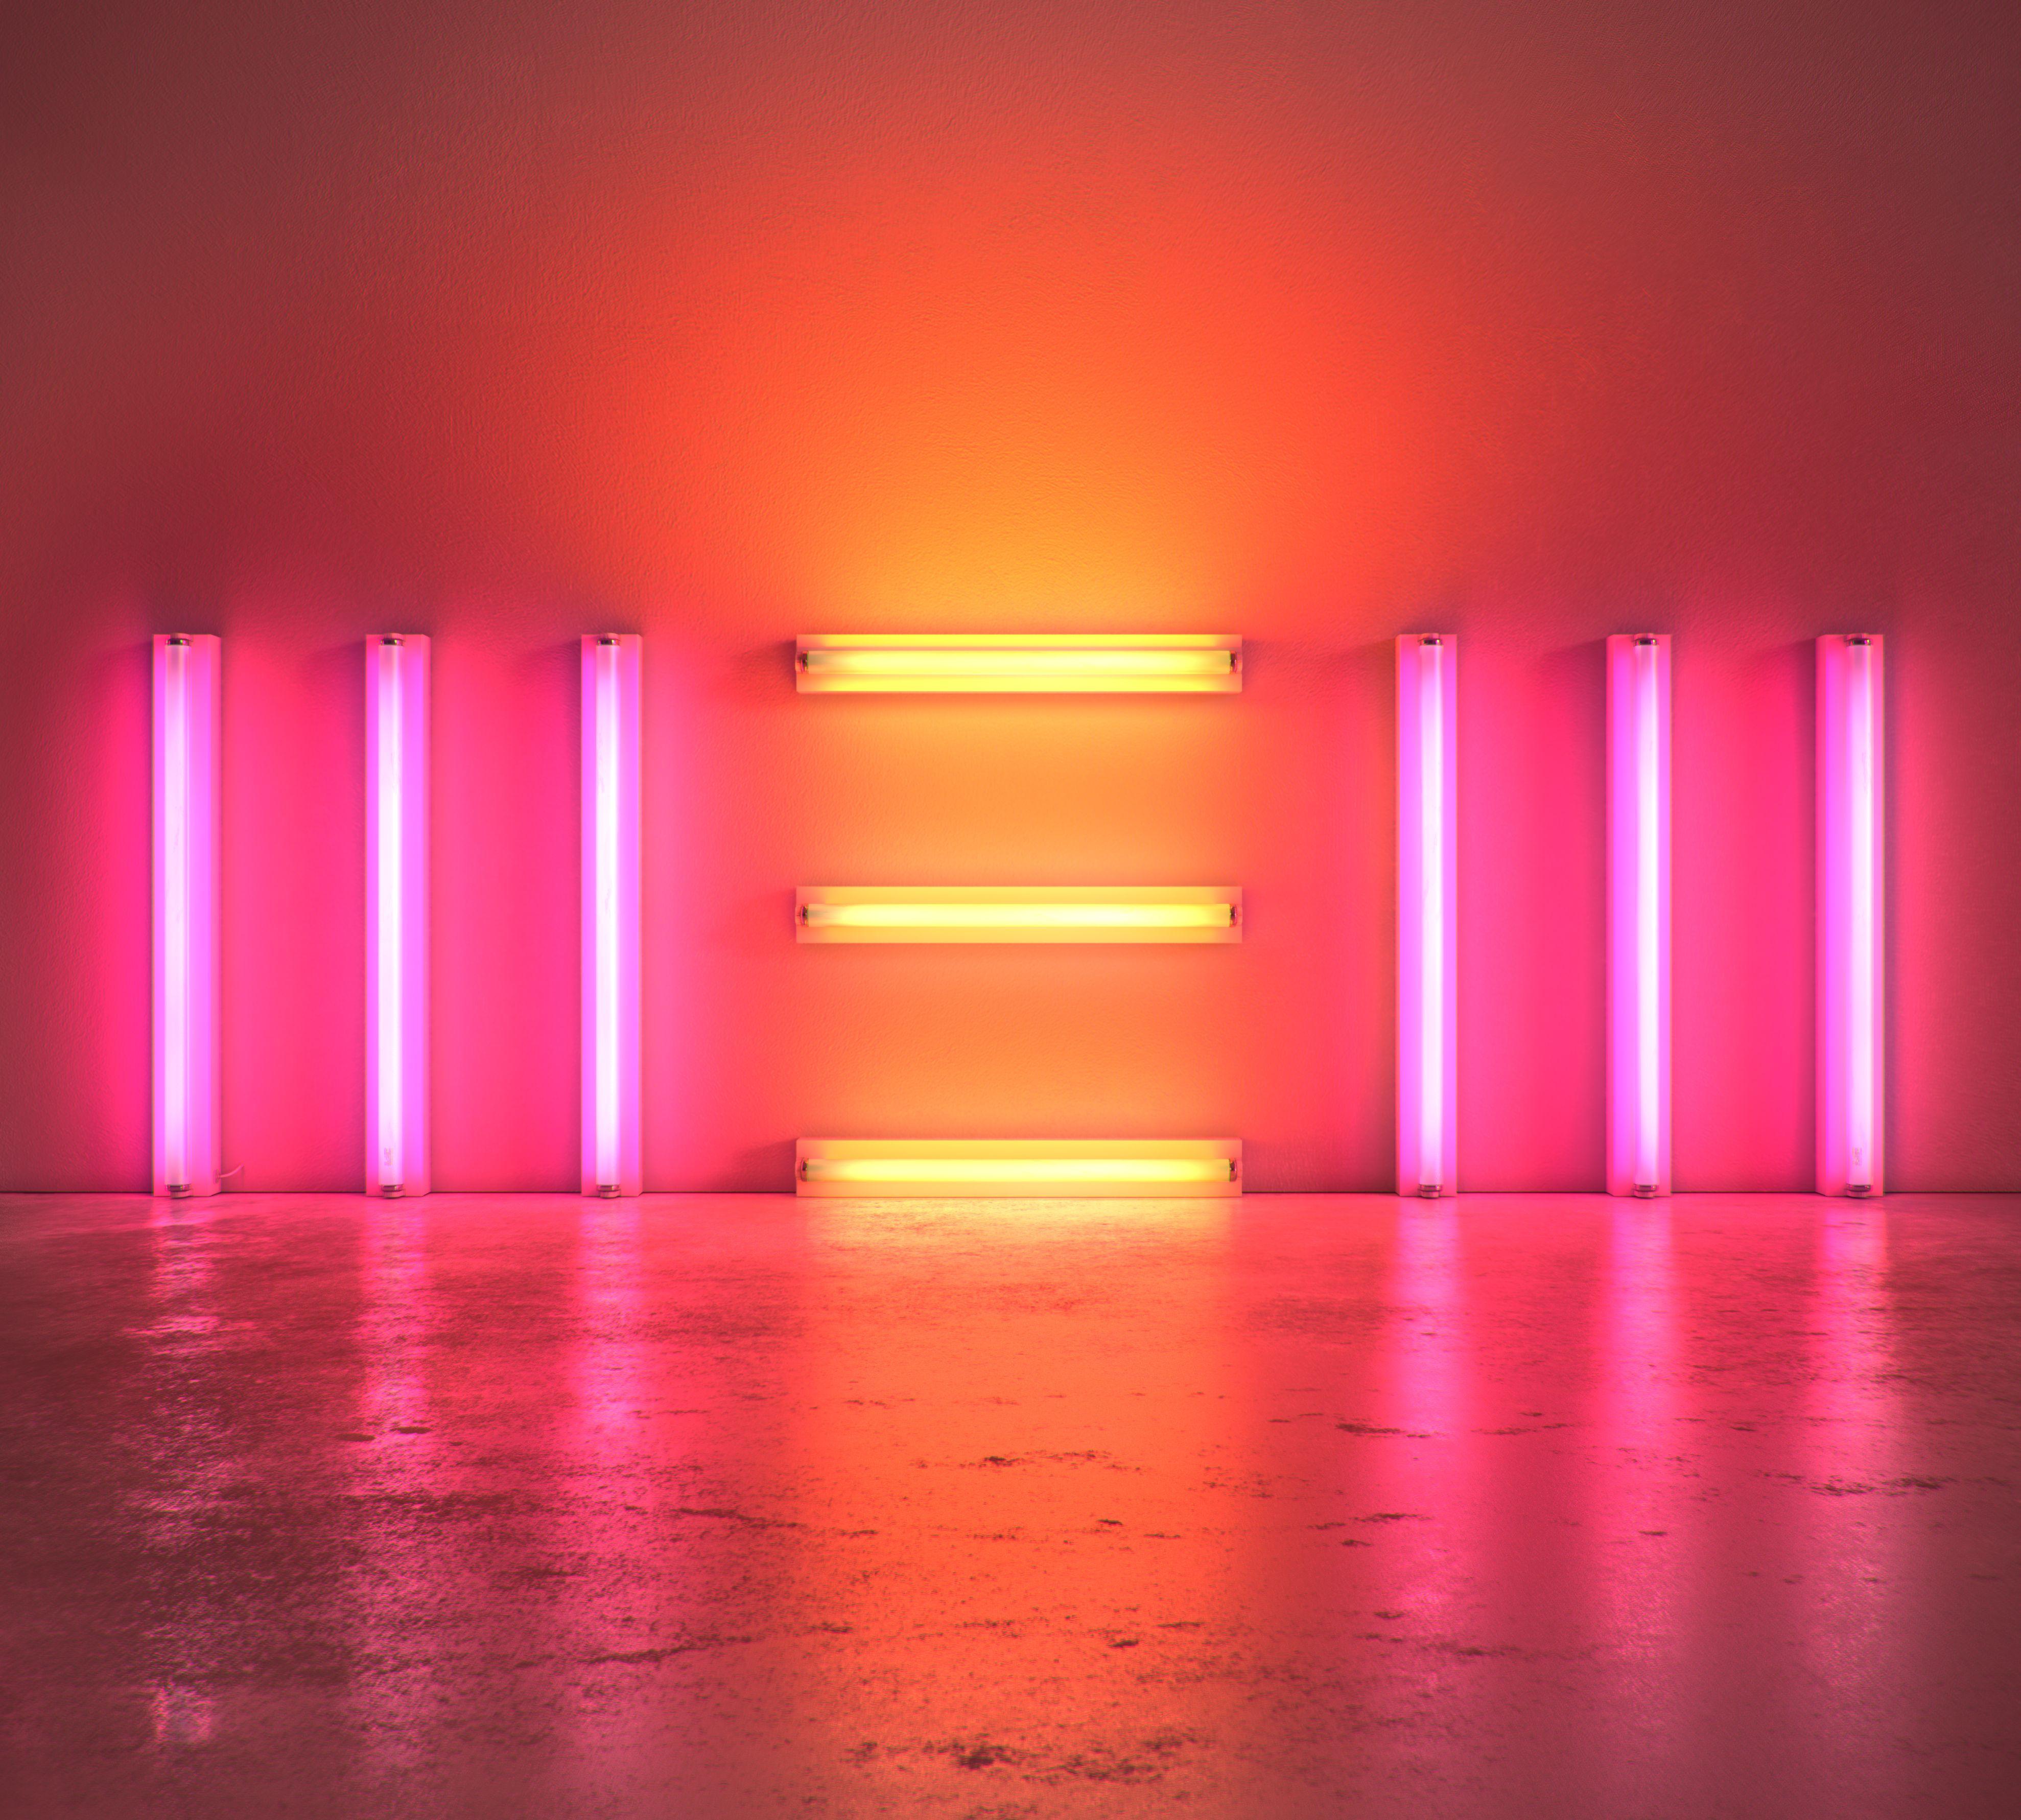 Paul McCartney - New album cover